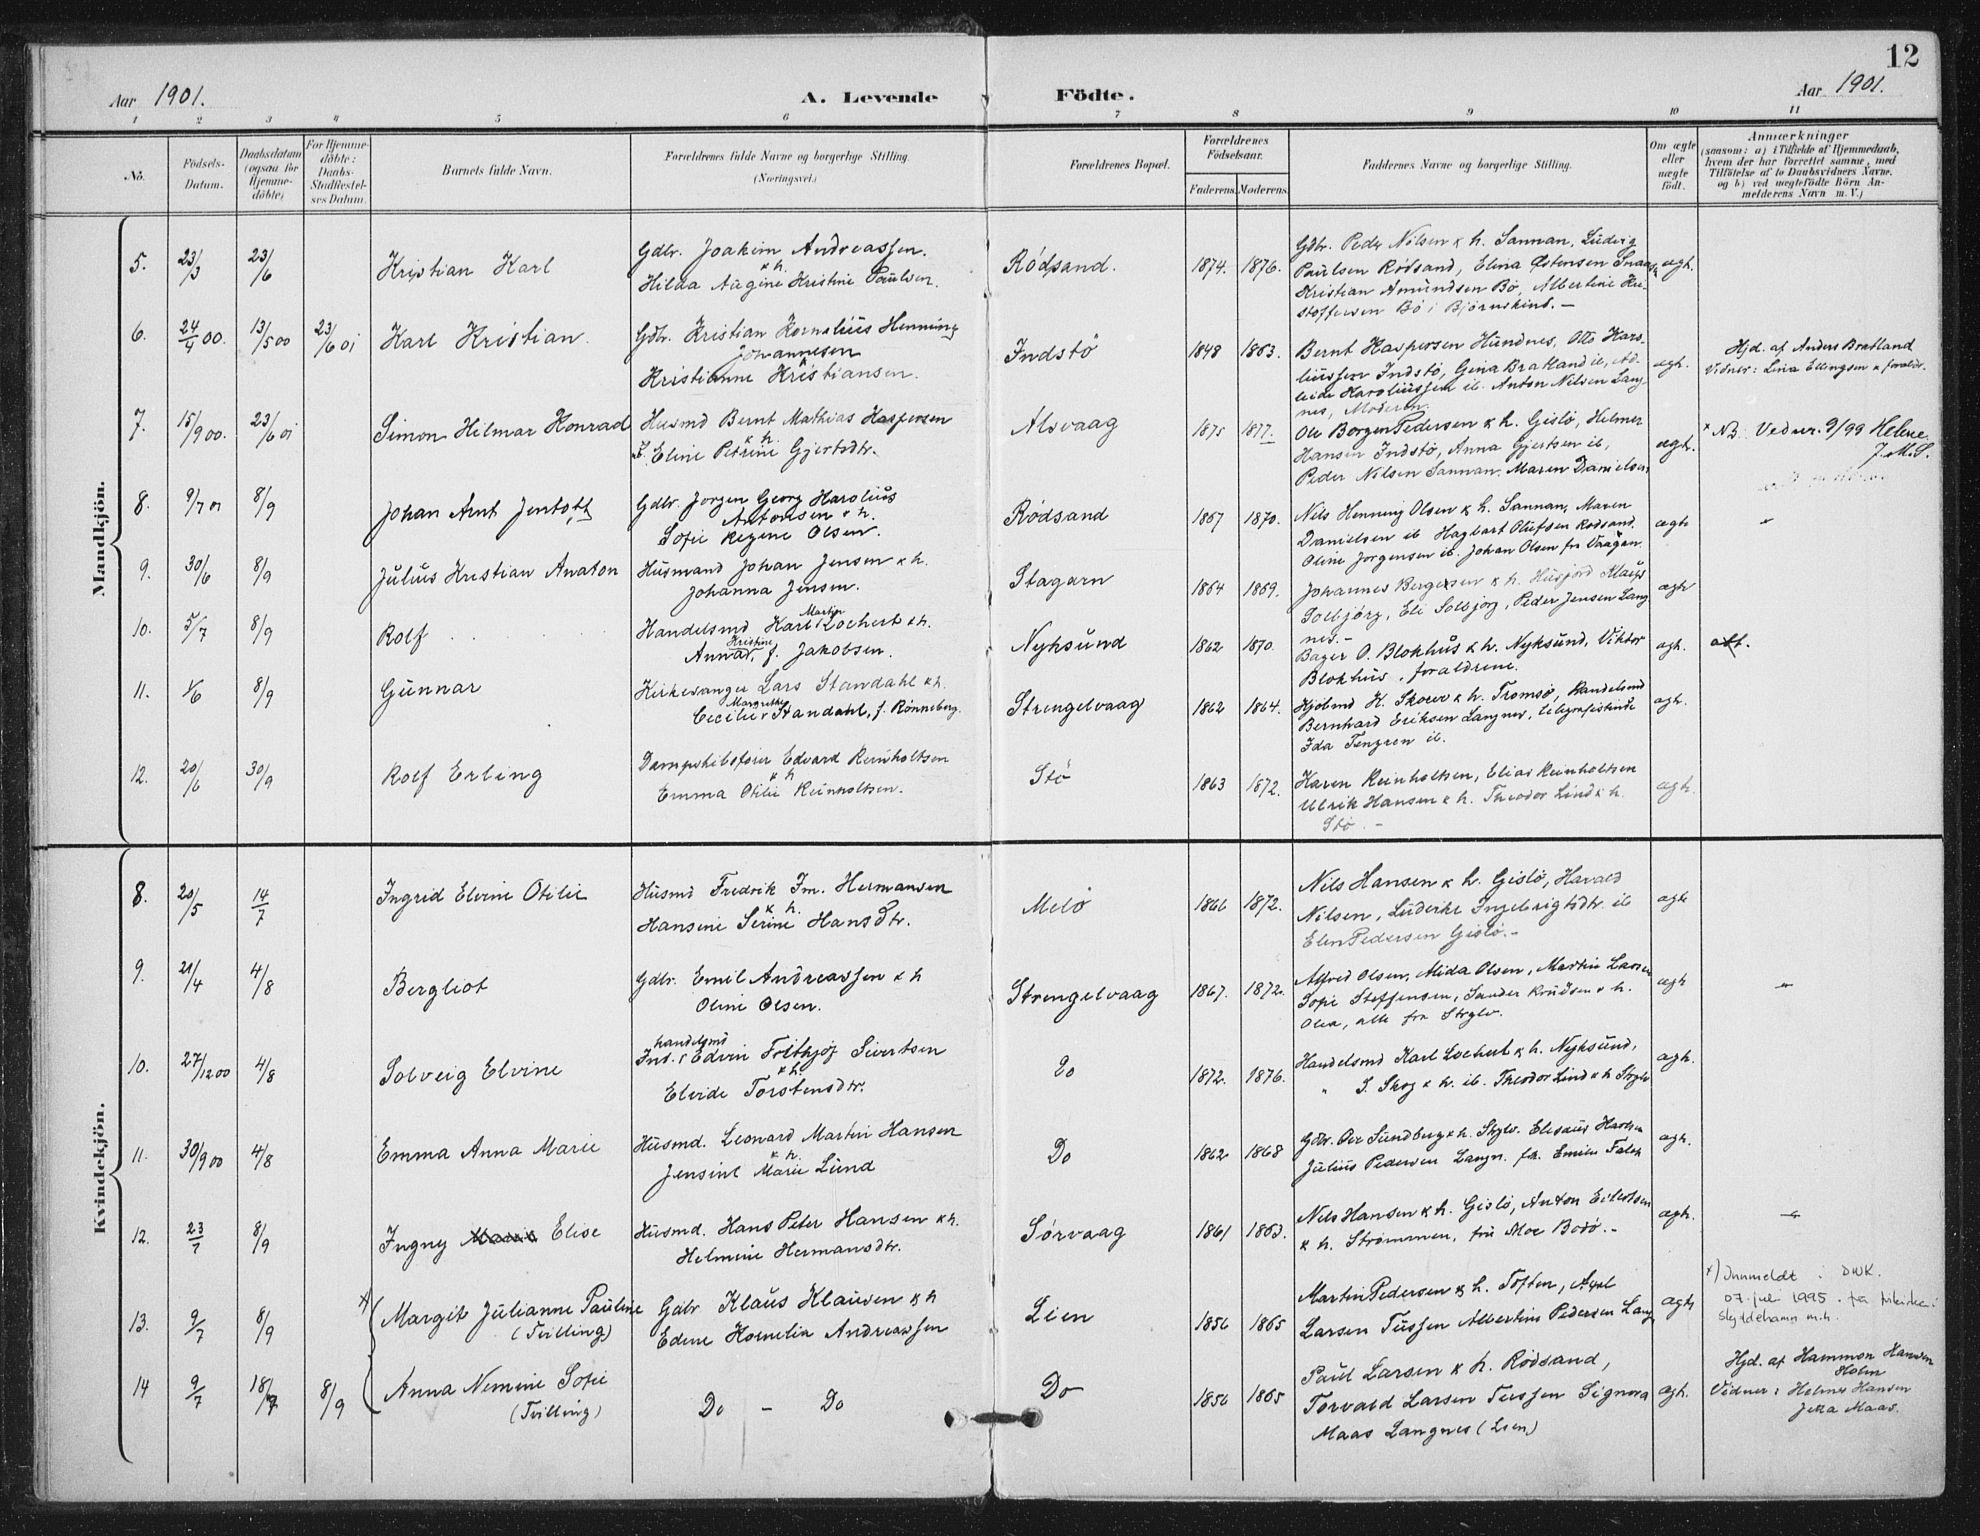 SAT, Ministerialprotokoller, klokkerbøker og fødselsregistre - Nordland, 894/L1356: Ministerialbok nr. 894A02, 1897-1914, s. 12